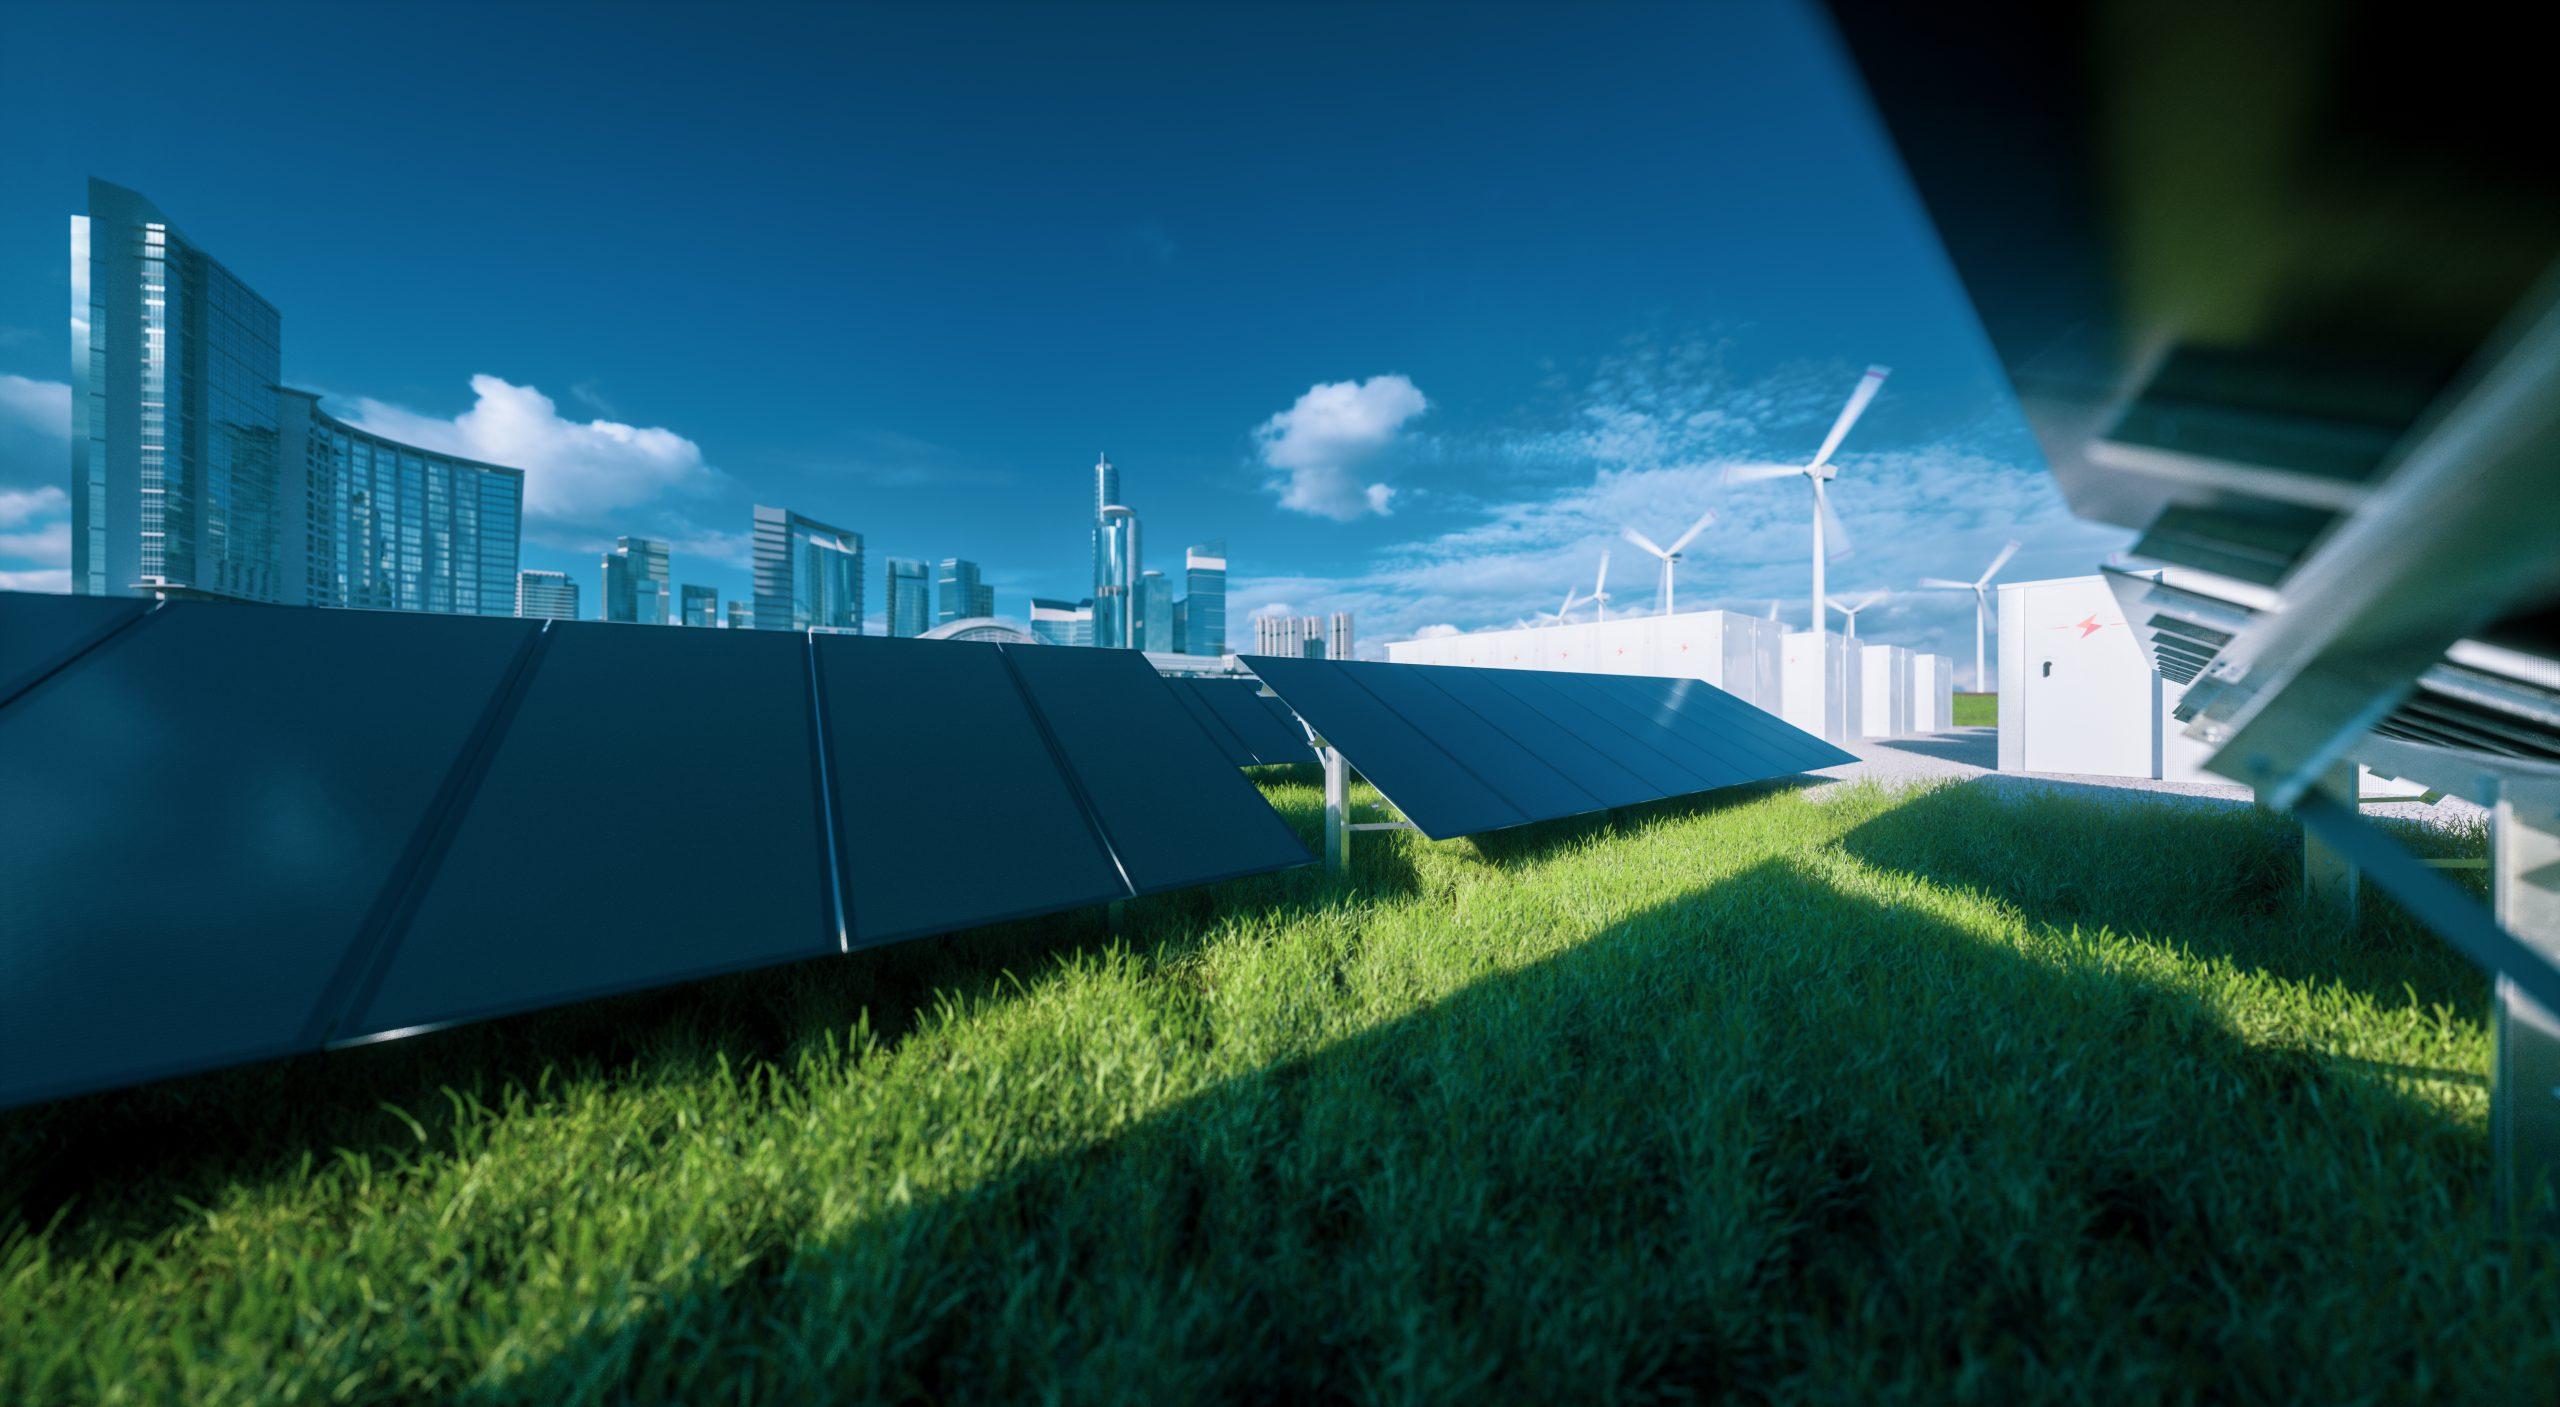 Awesense Deploys Its Digital Energy Platform To Accelerate V2G, Storage And Microgrid Integration With Northwest Utility.